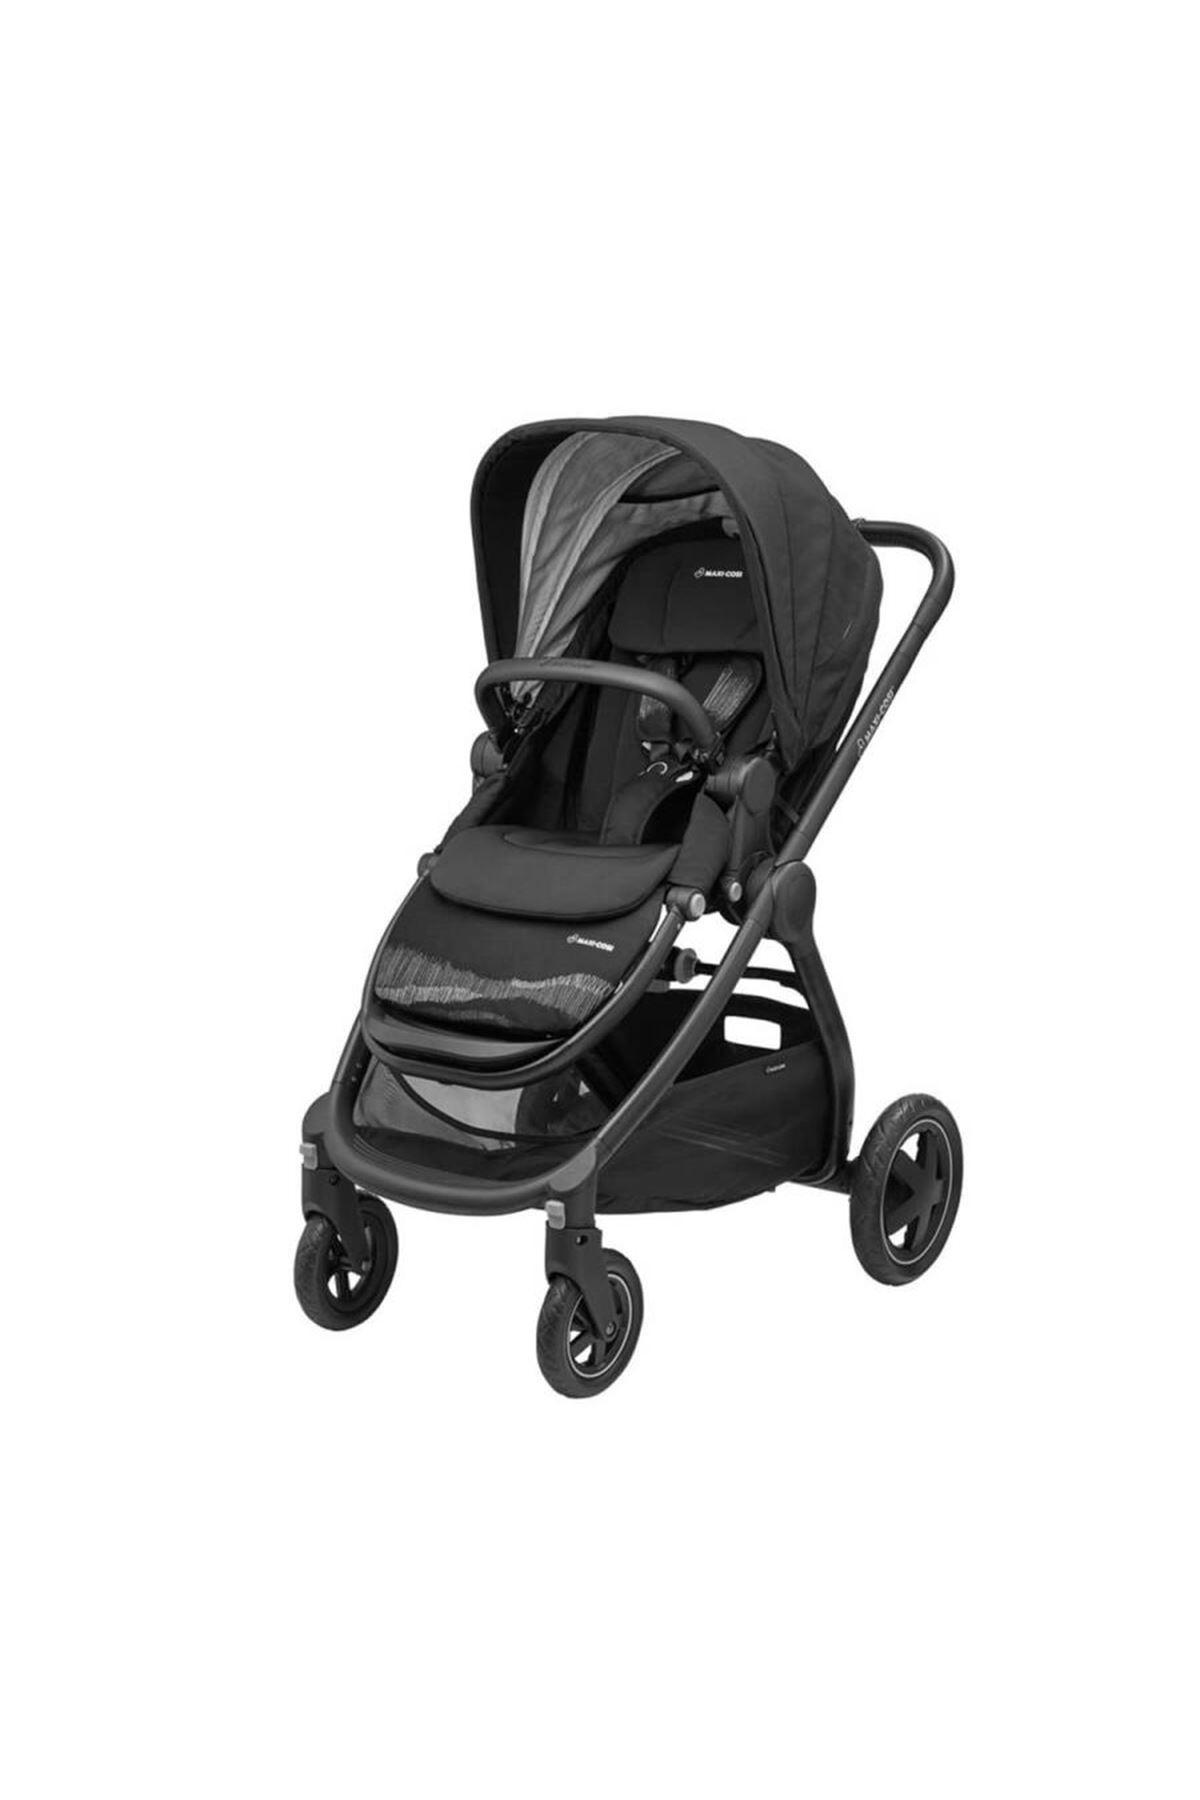 Maxi-Cosi Adorra-Cabriofix Travel Sistem Bebek Arabası / Frequency Black